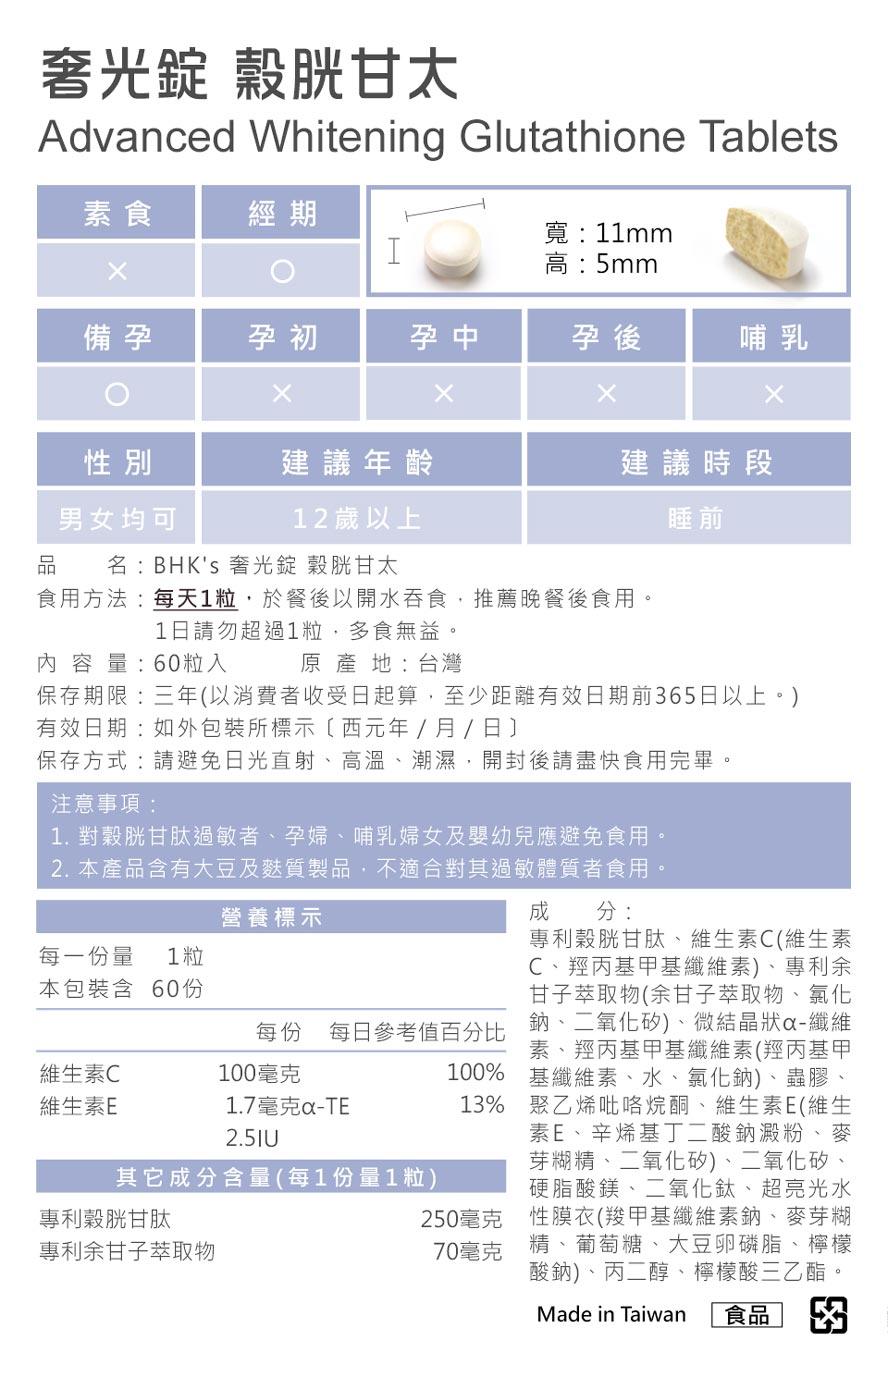 BHK's奢光、熊果素高規格專利複方,膠原胜肽+GSH